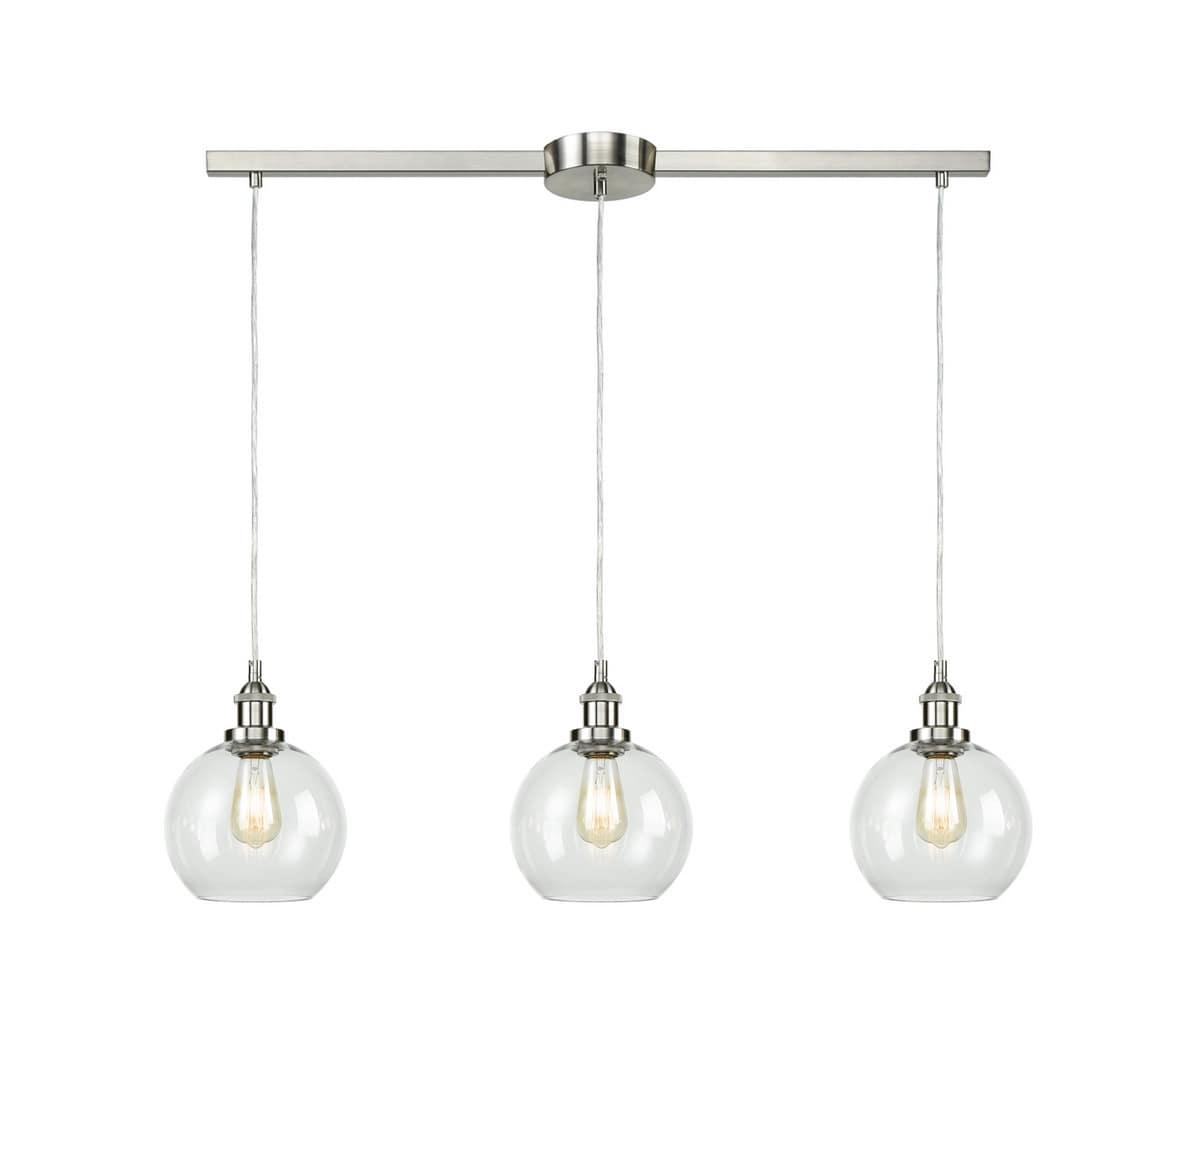 Clear Modern Globe Glass Kitchen Island Pendant Lighting Fixtures